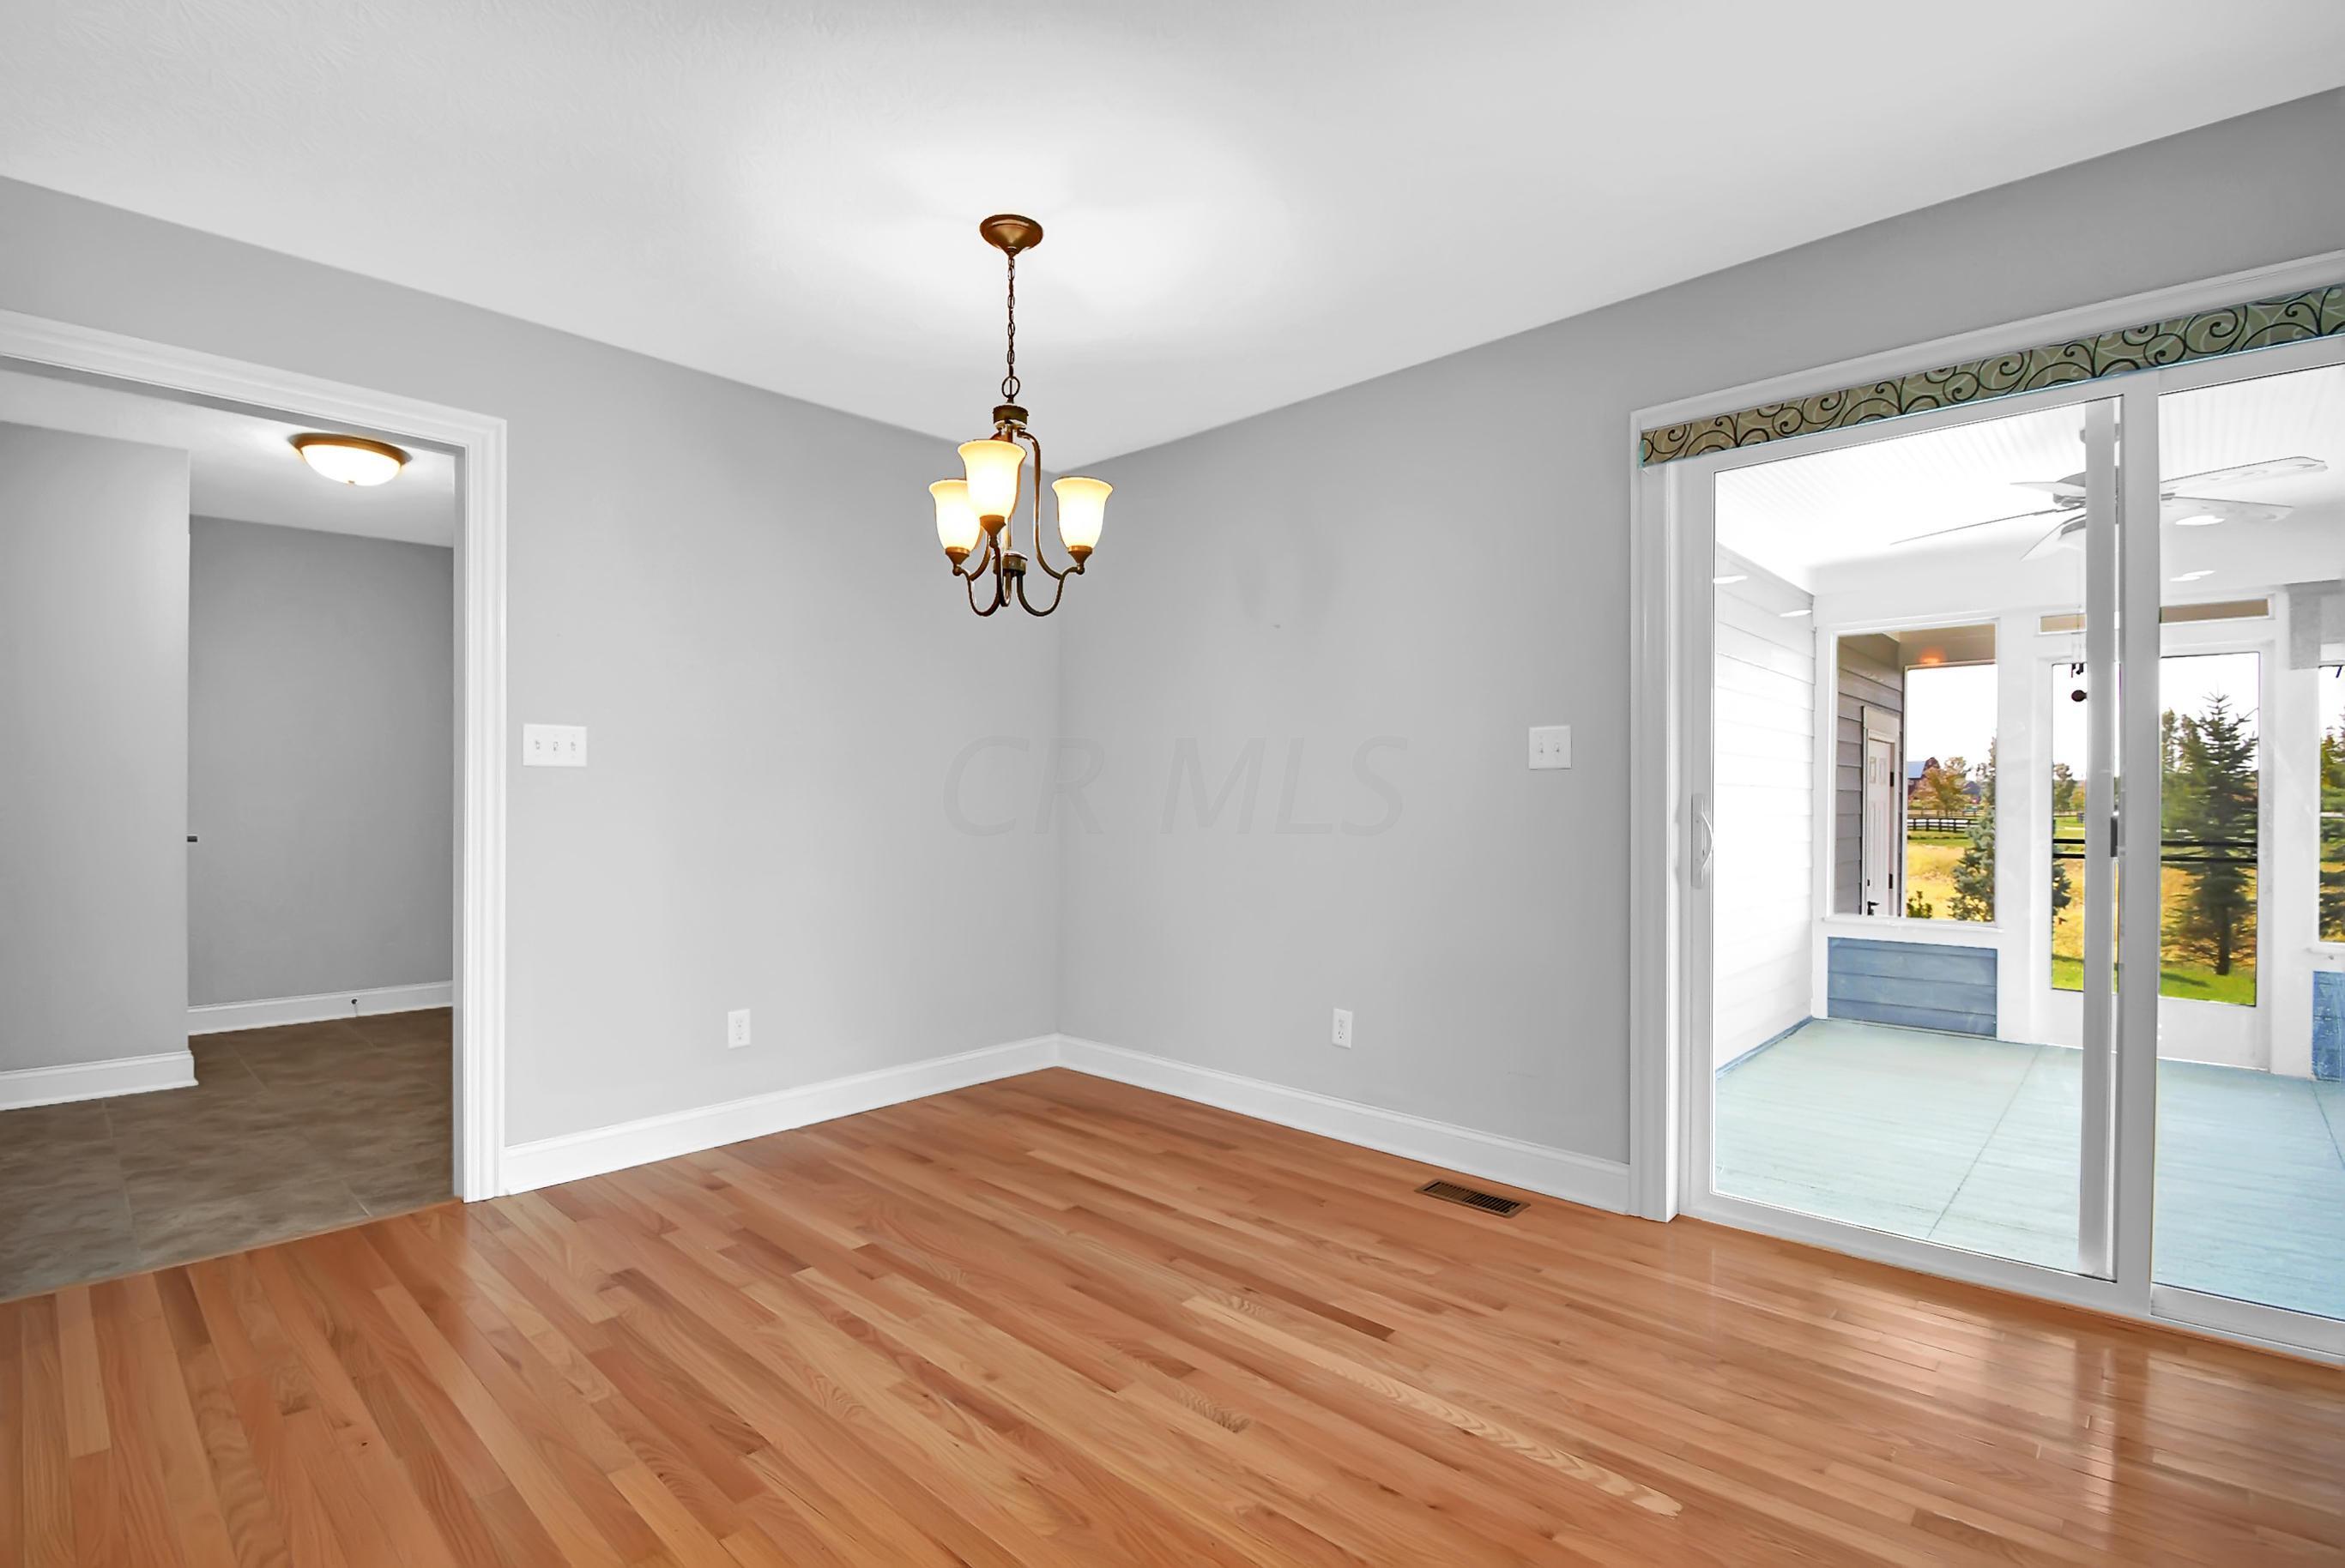 10641 Arrowwood Drive, Plain City, Ohio 43064, 3 Bedrooms Bedrooms, ,3 BathroomsBathrooms,Residential,For Sale,Arrowwood,221000568